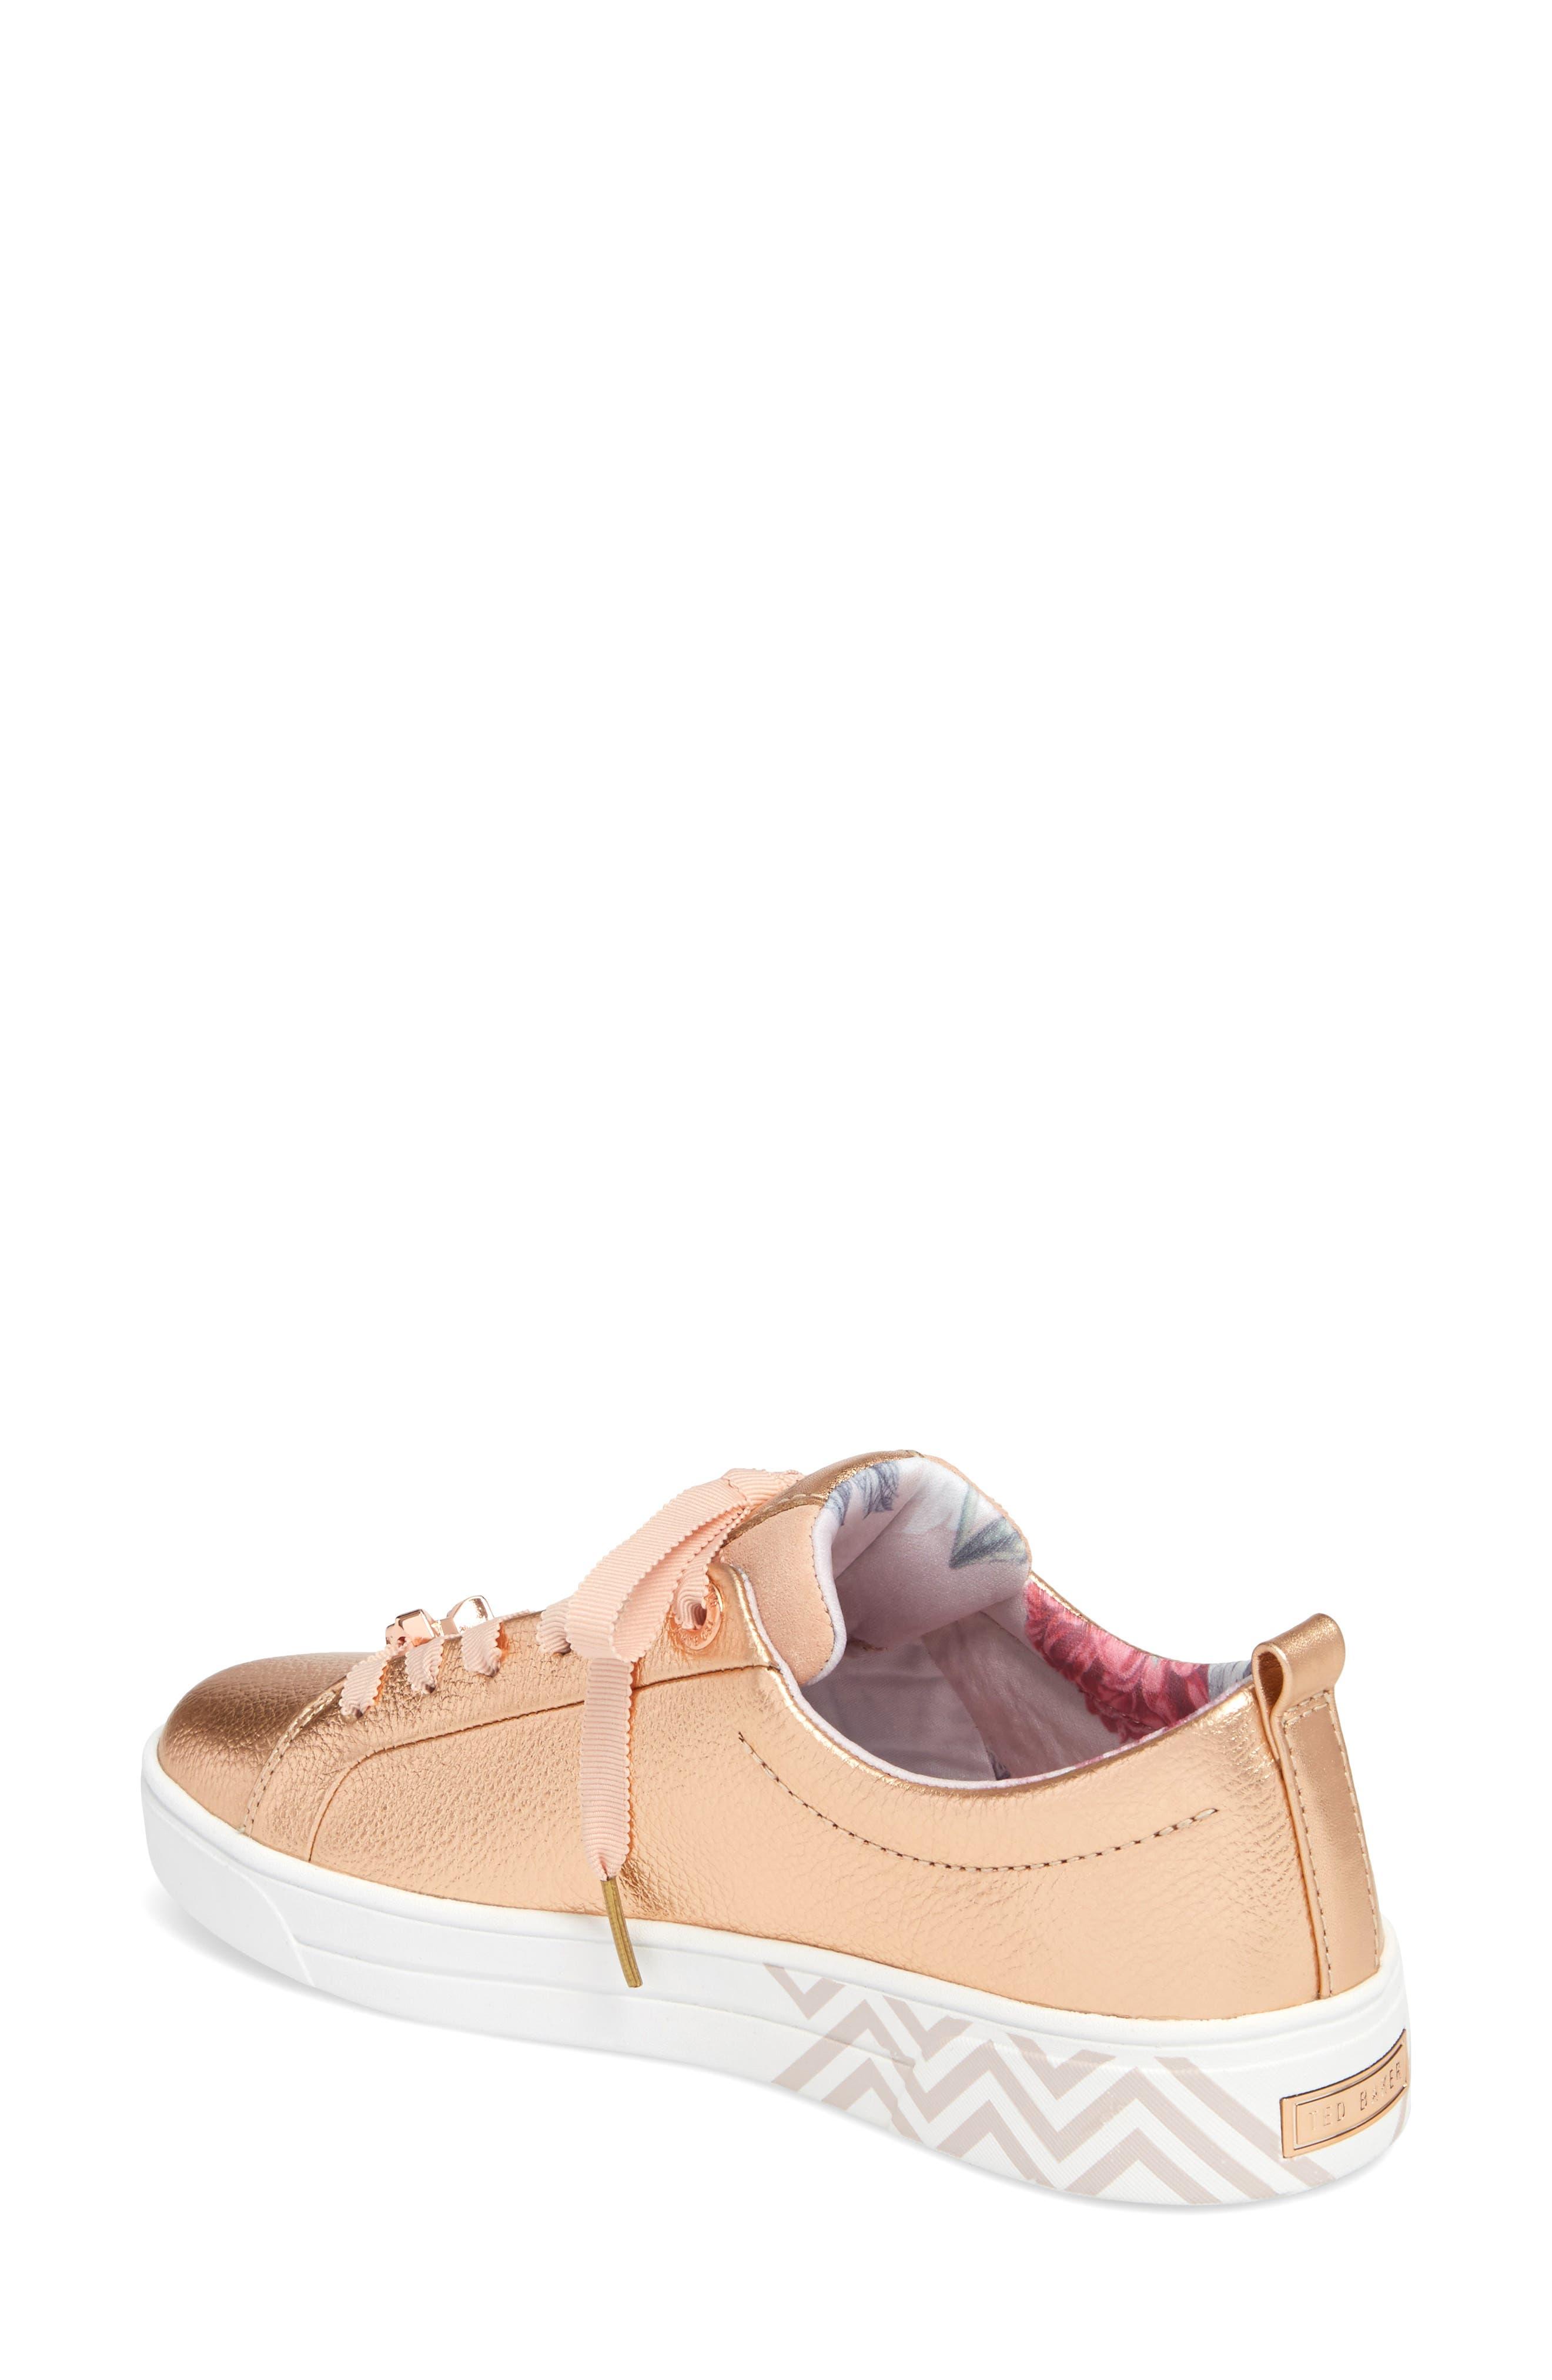 Kelleip Sneaker,                             Alternate thumbnail 2, color,                             ROSE GOLD/ PALACE GARDENS